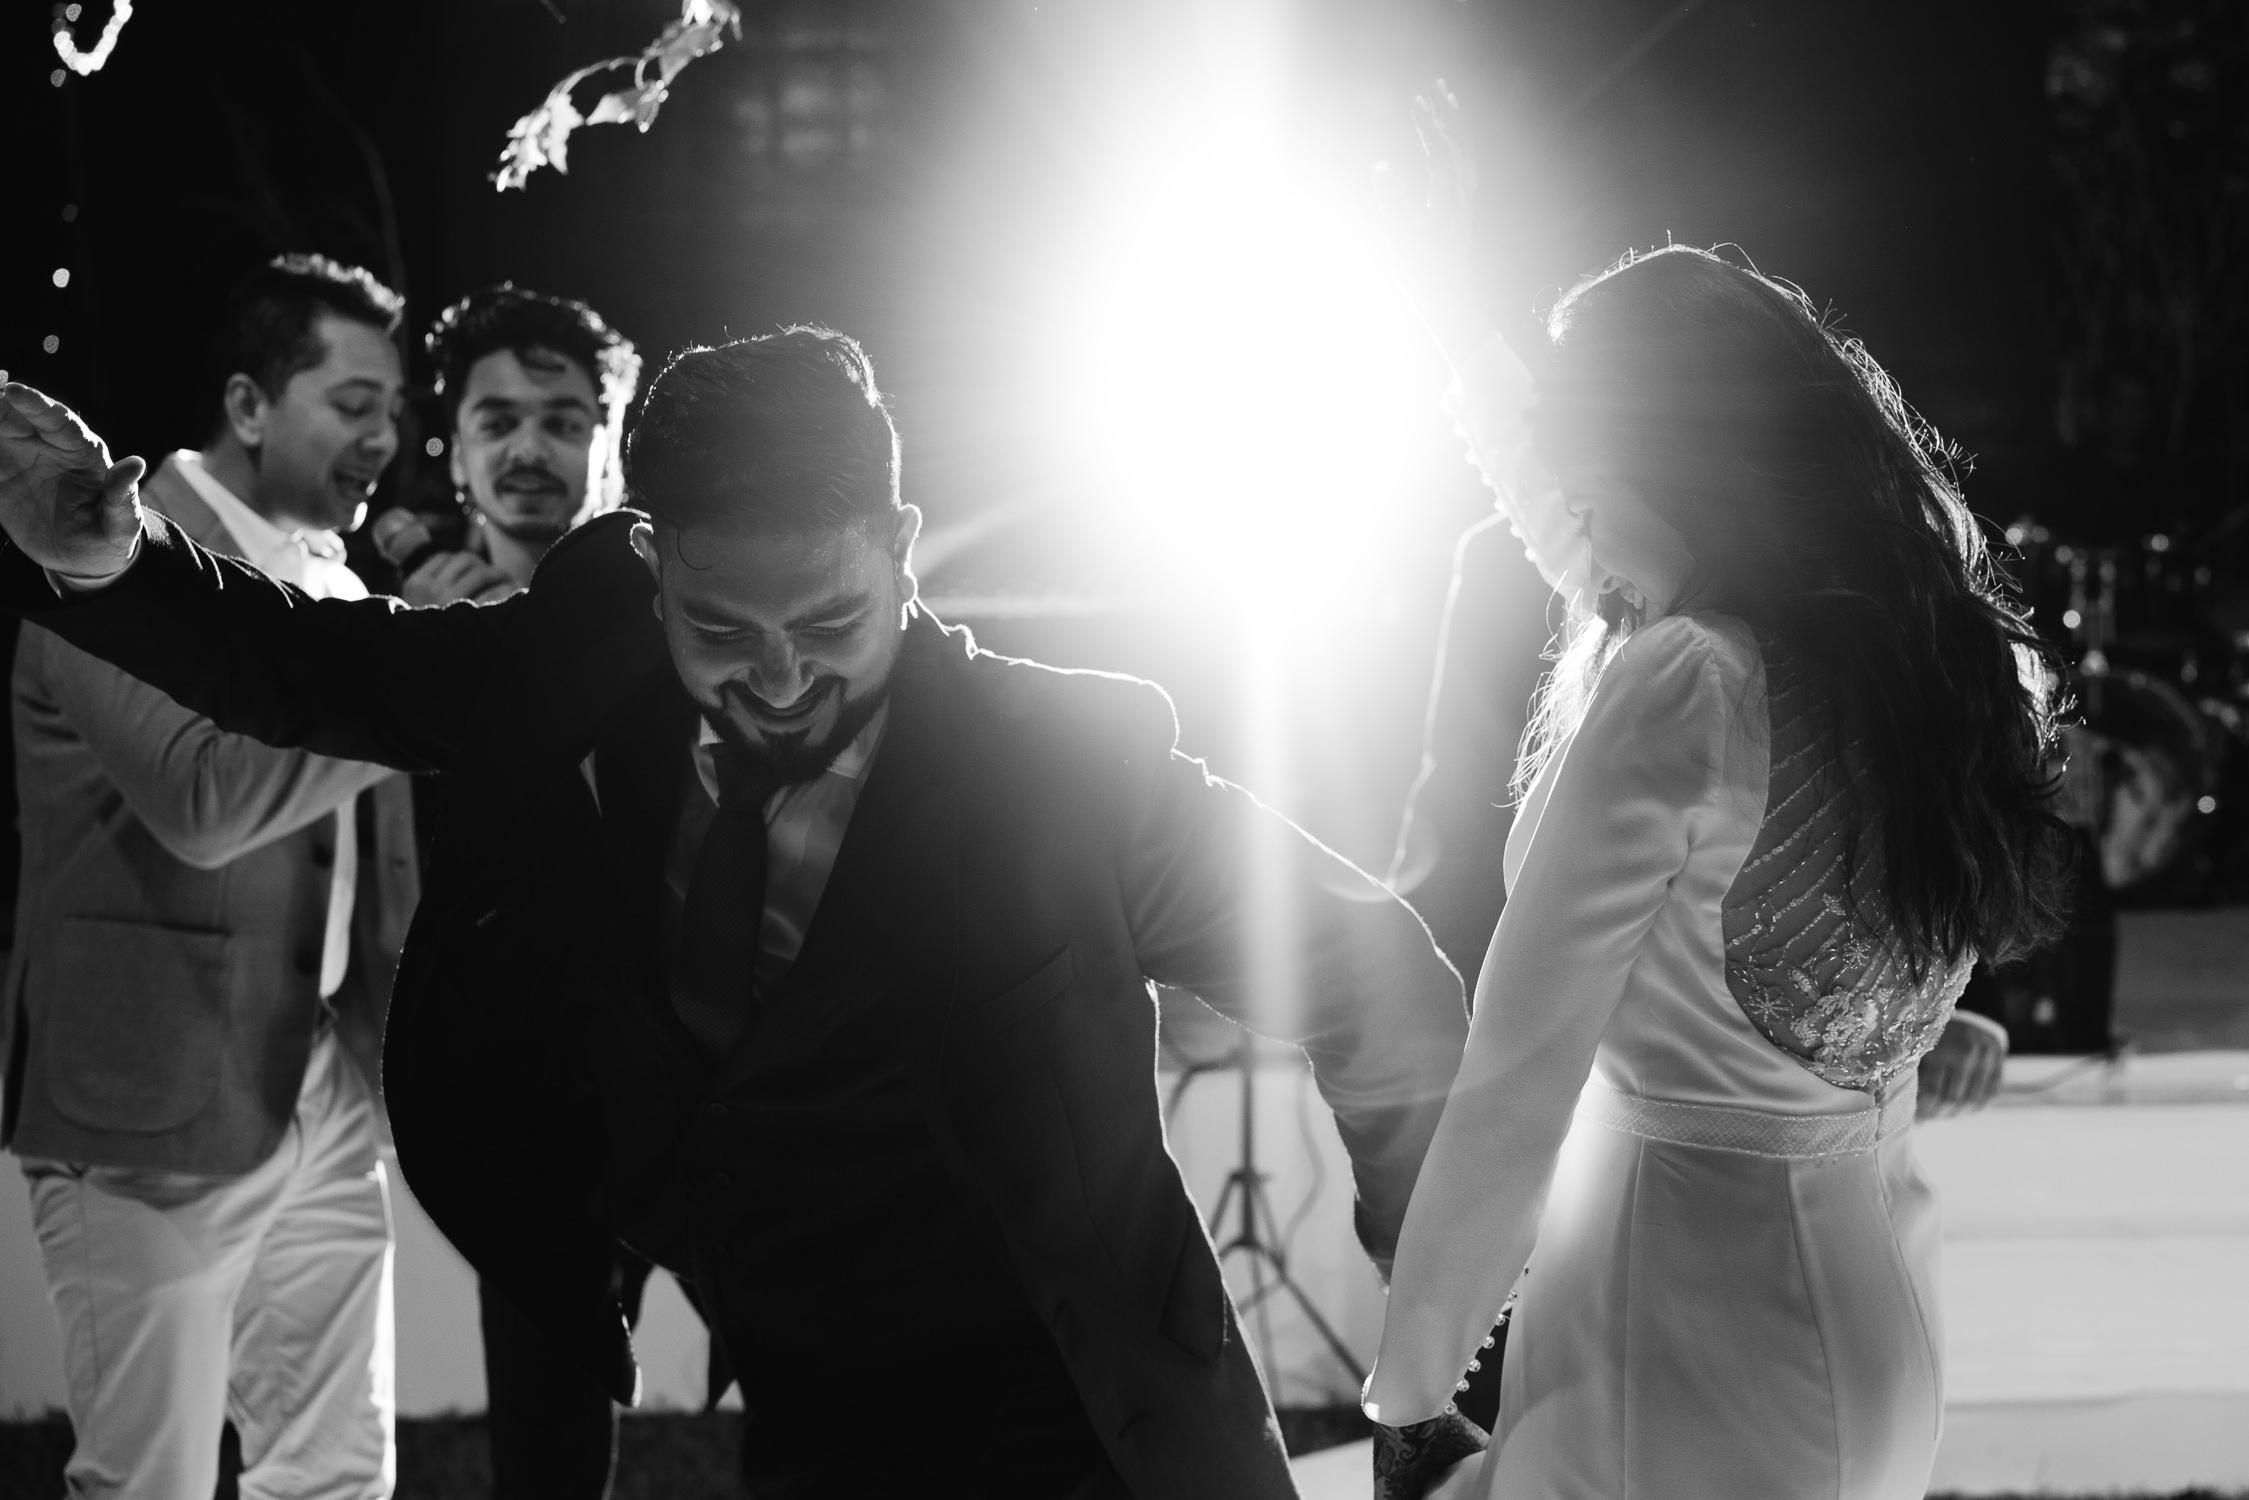 indian wedding party flash photography mark hadden